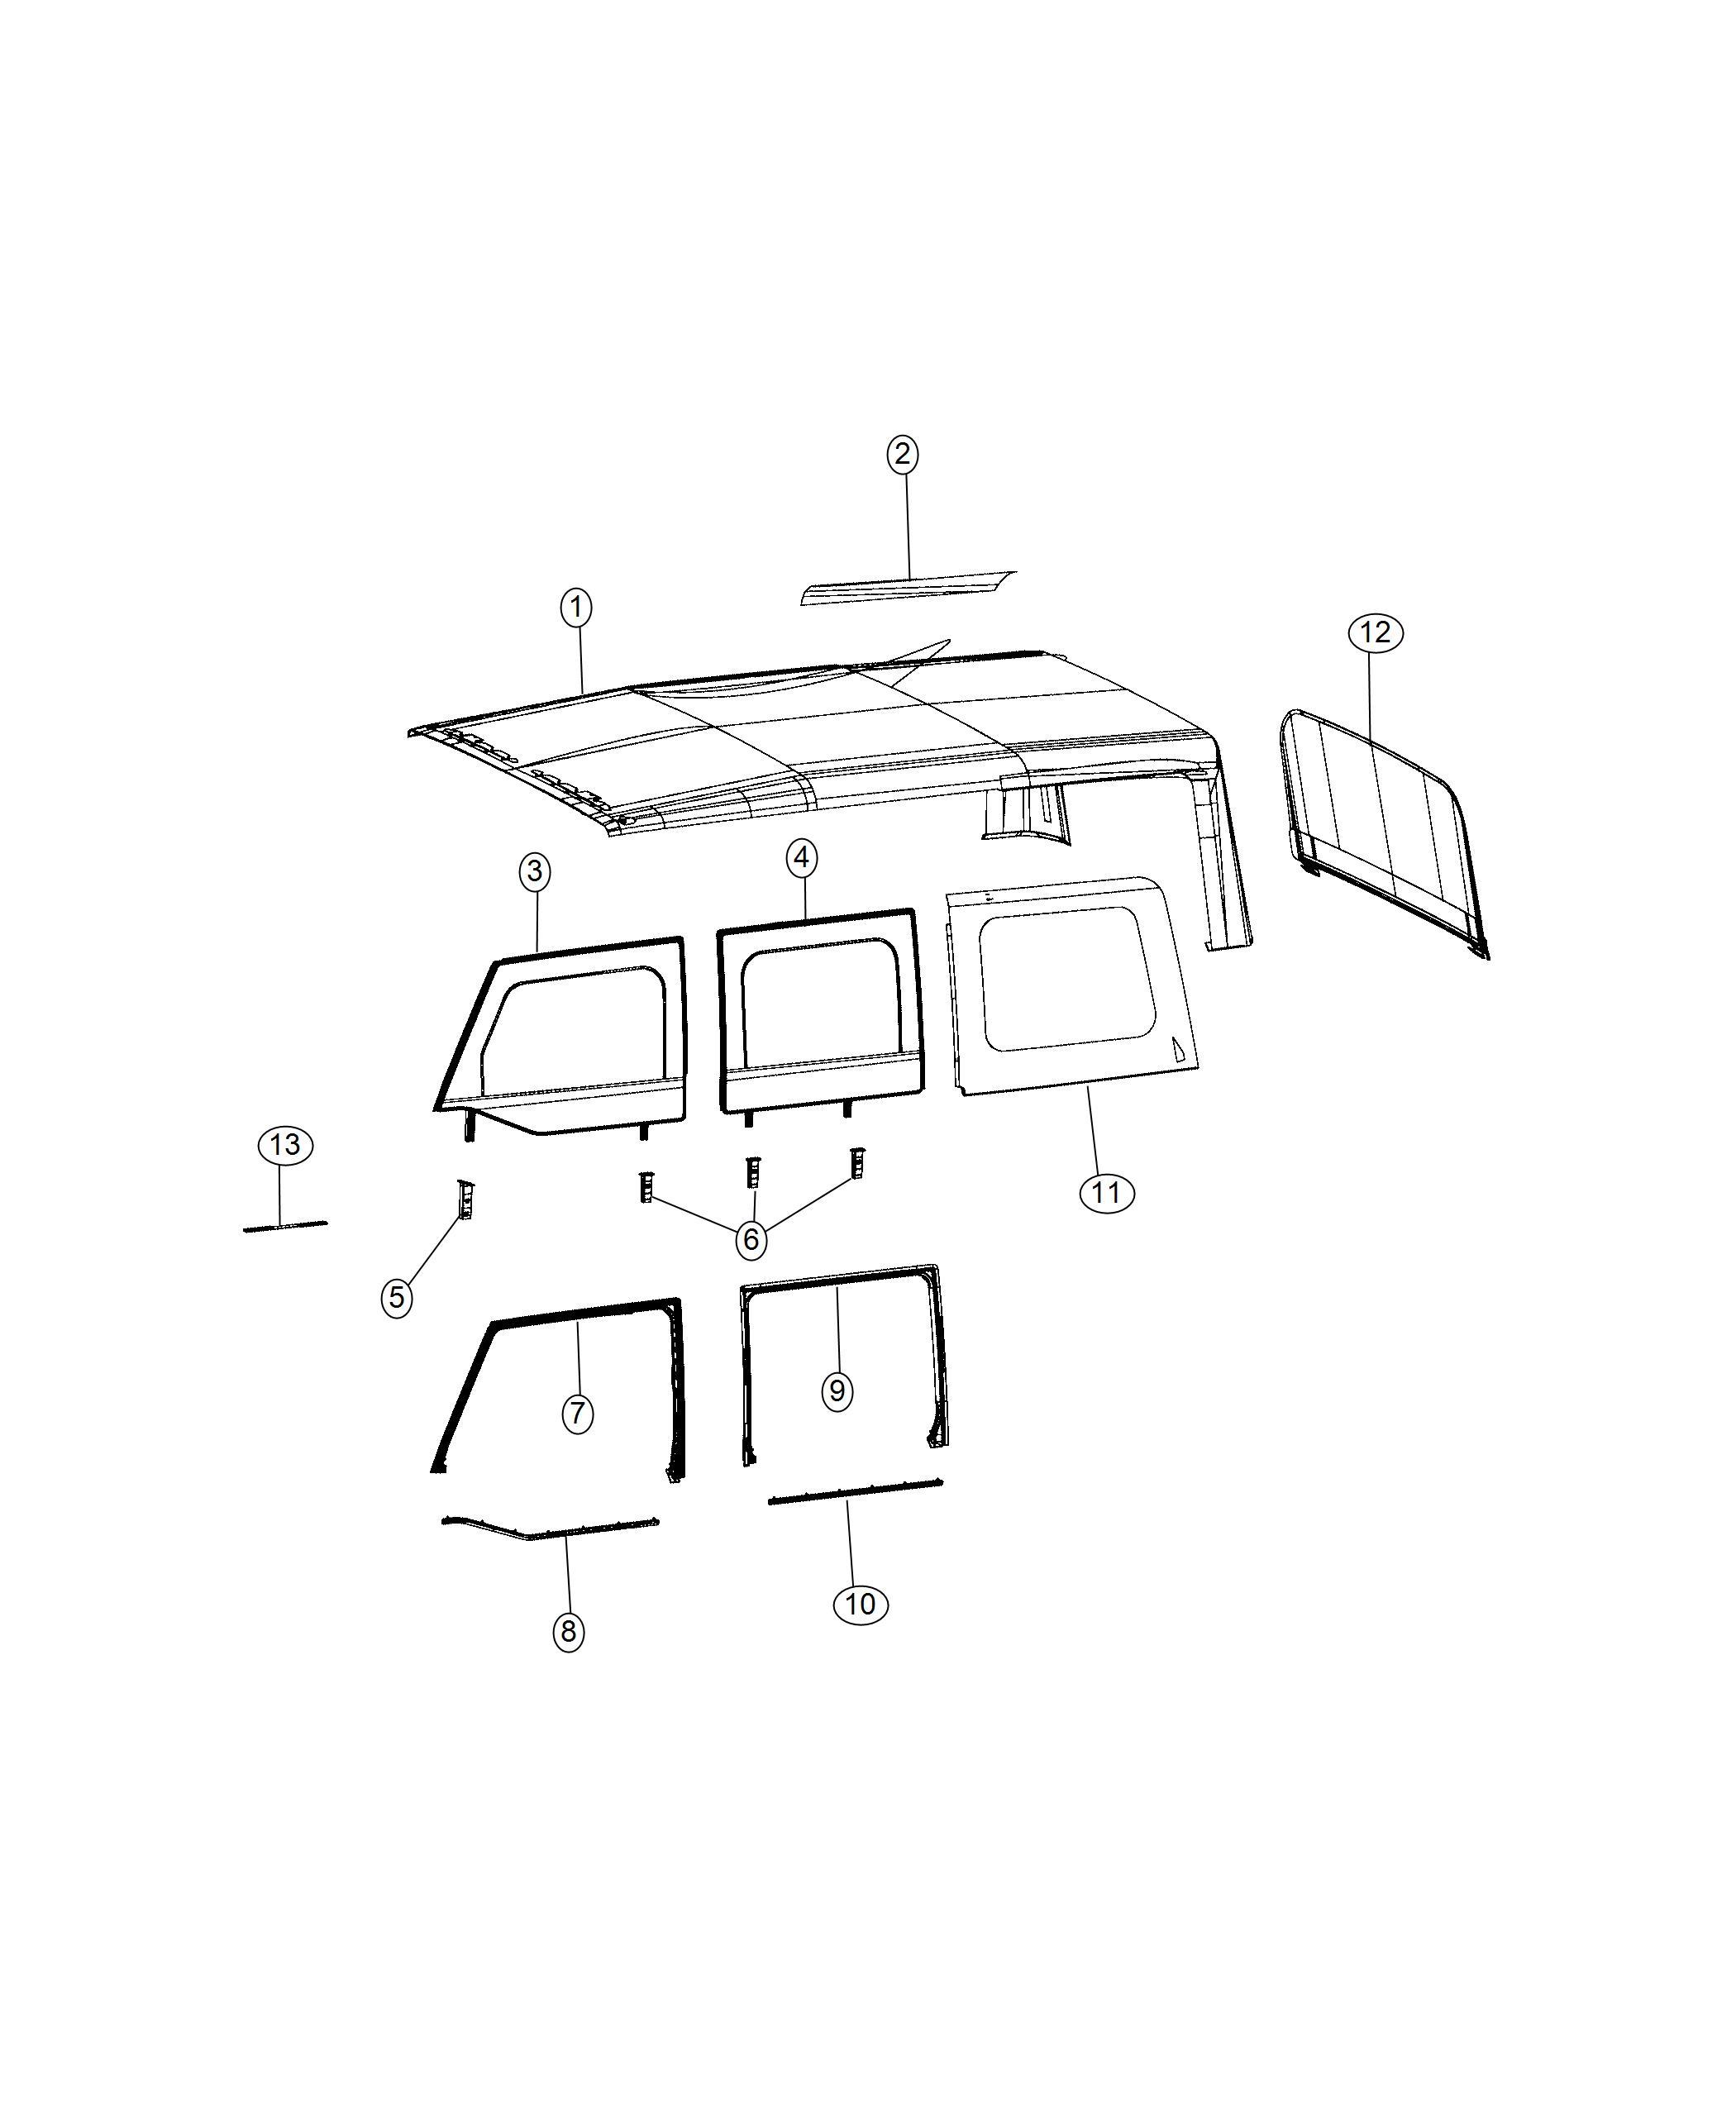 2009 Jeep Wrangler Unlimited Radio Wiring Diagram: Jeep Wrangler Window. Quarter. Left. Color: [no